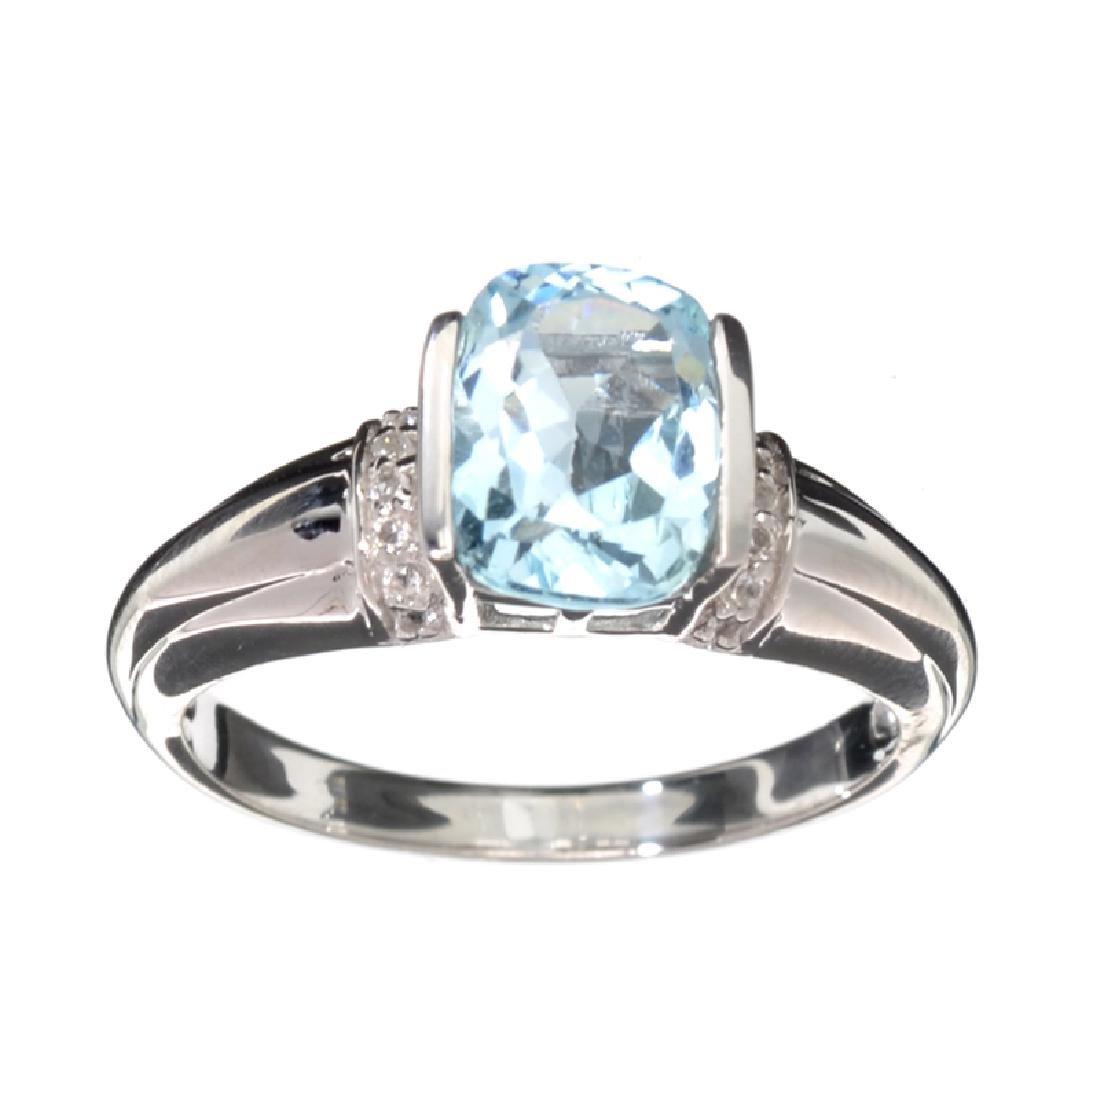 APP: 0.4k Fine Jewelry 2.53CT Topaz And White Sapphire